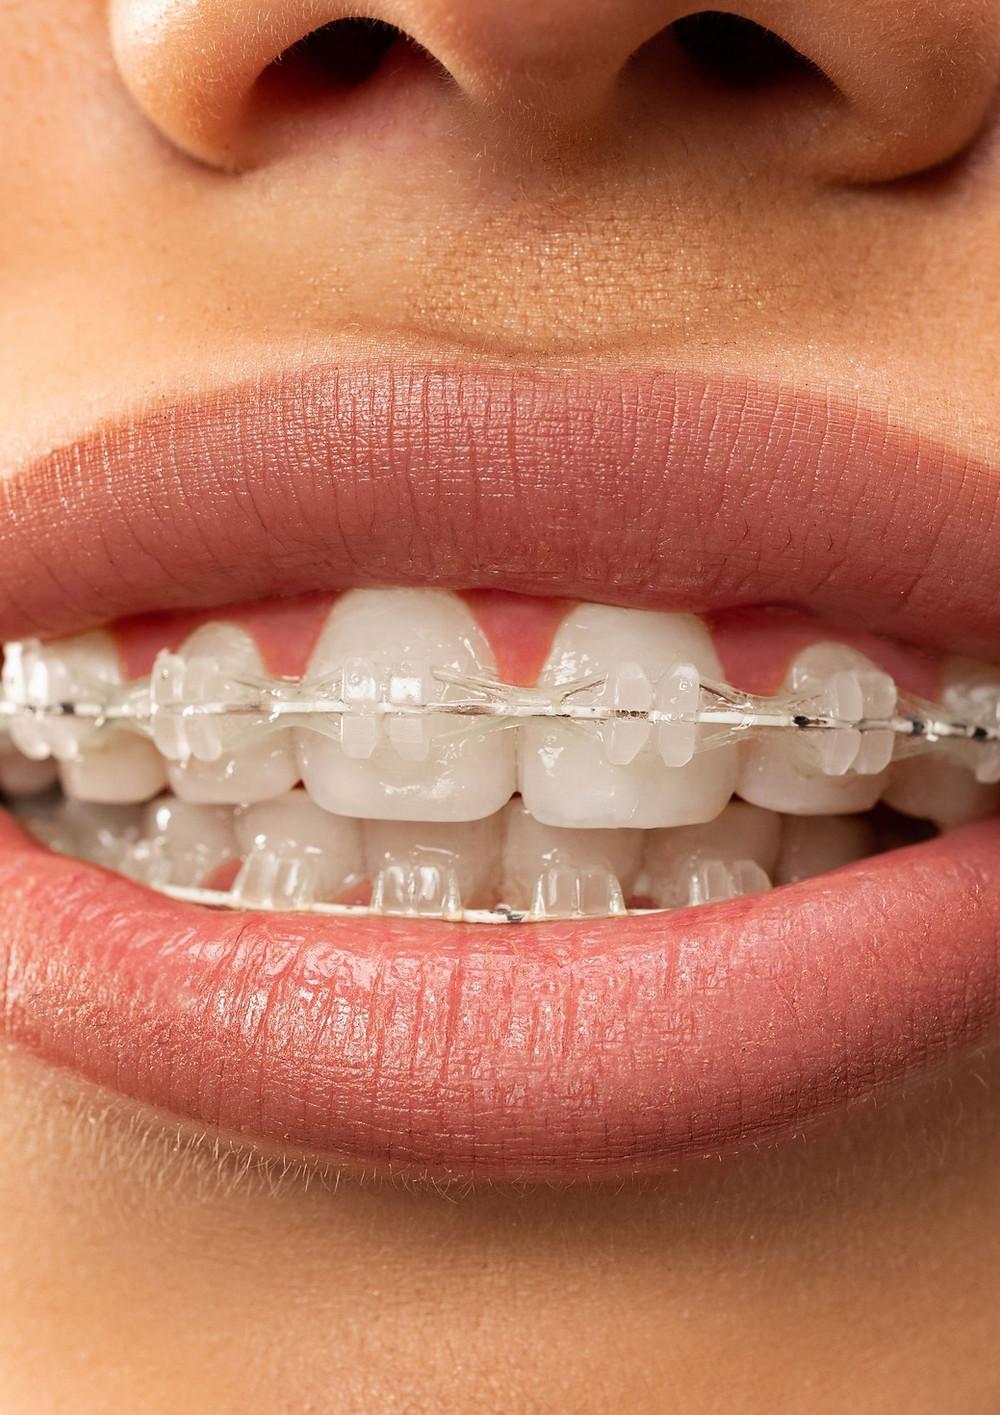 Ceramic teeth braces at Elite dental Clinics new Cairo